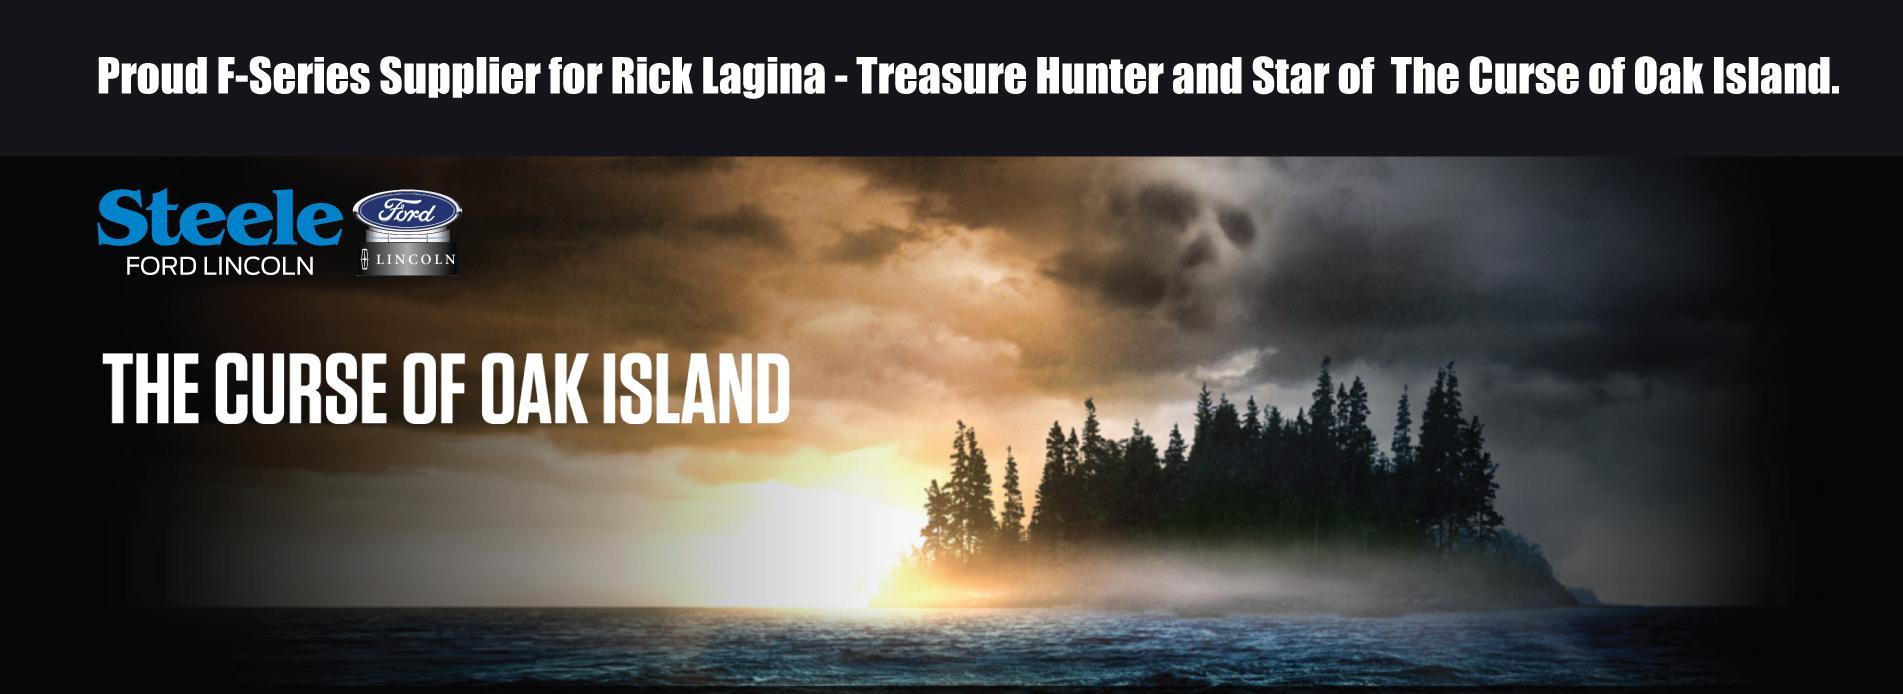 Oak Island Sponsorship